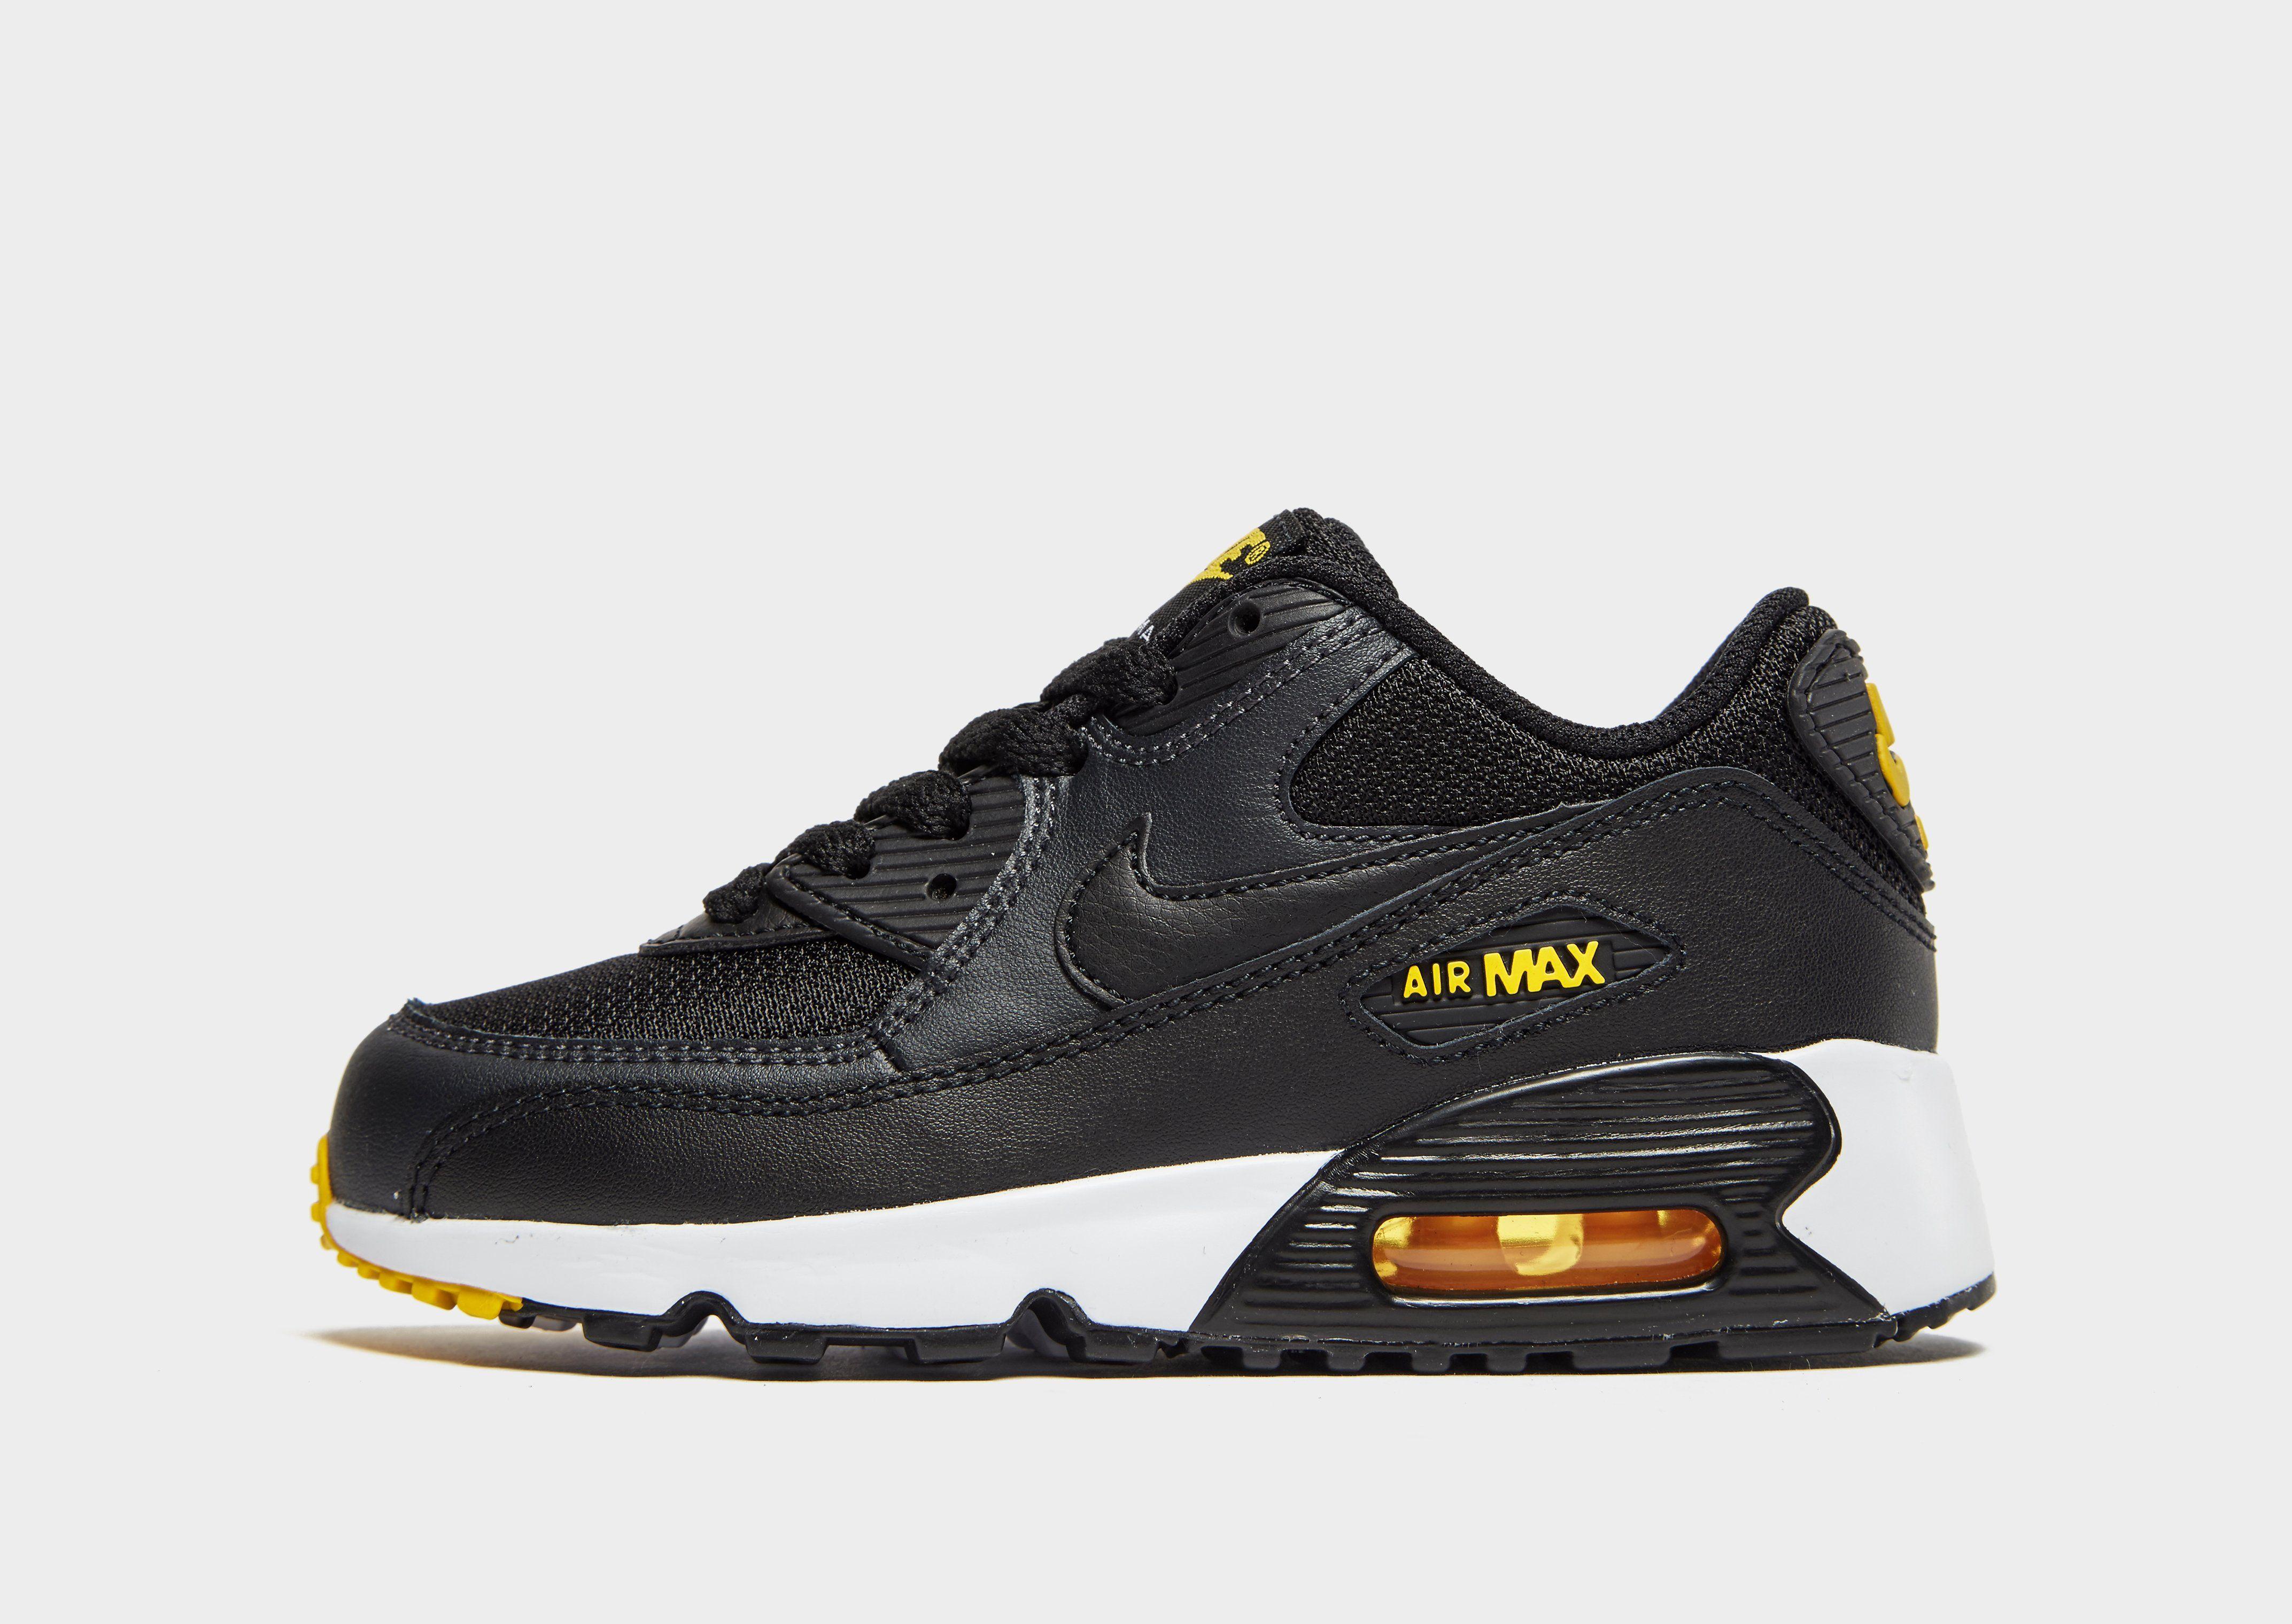 premium selection 6fb62 c5666 Nike Air Max 90 Children   JD Sports